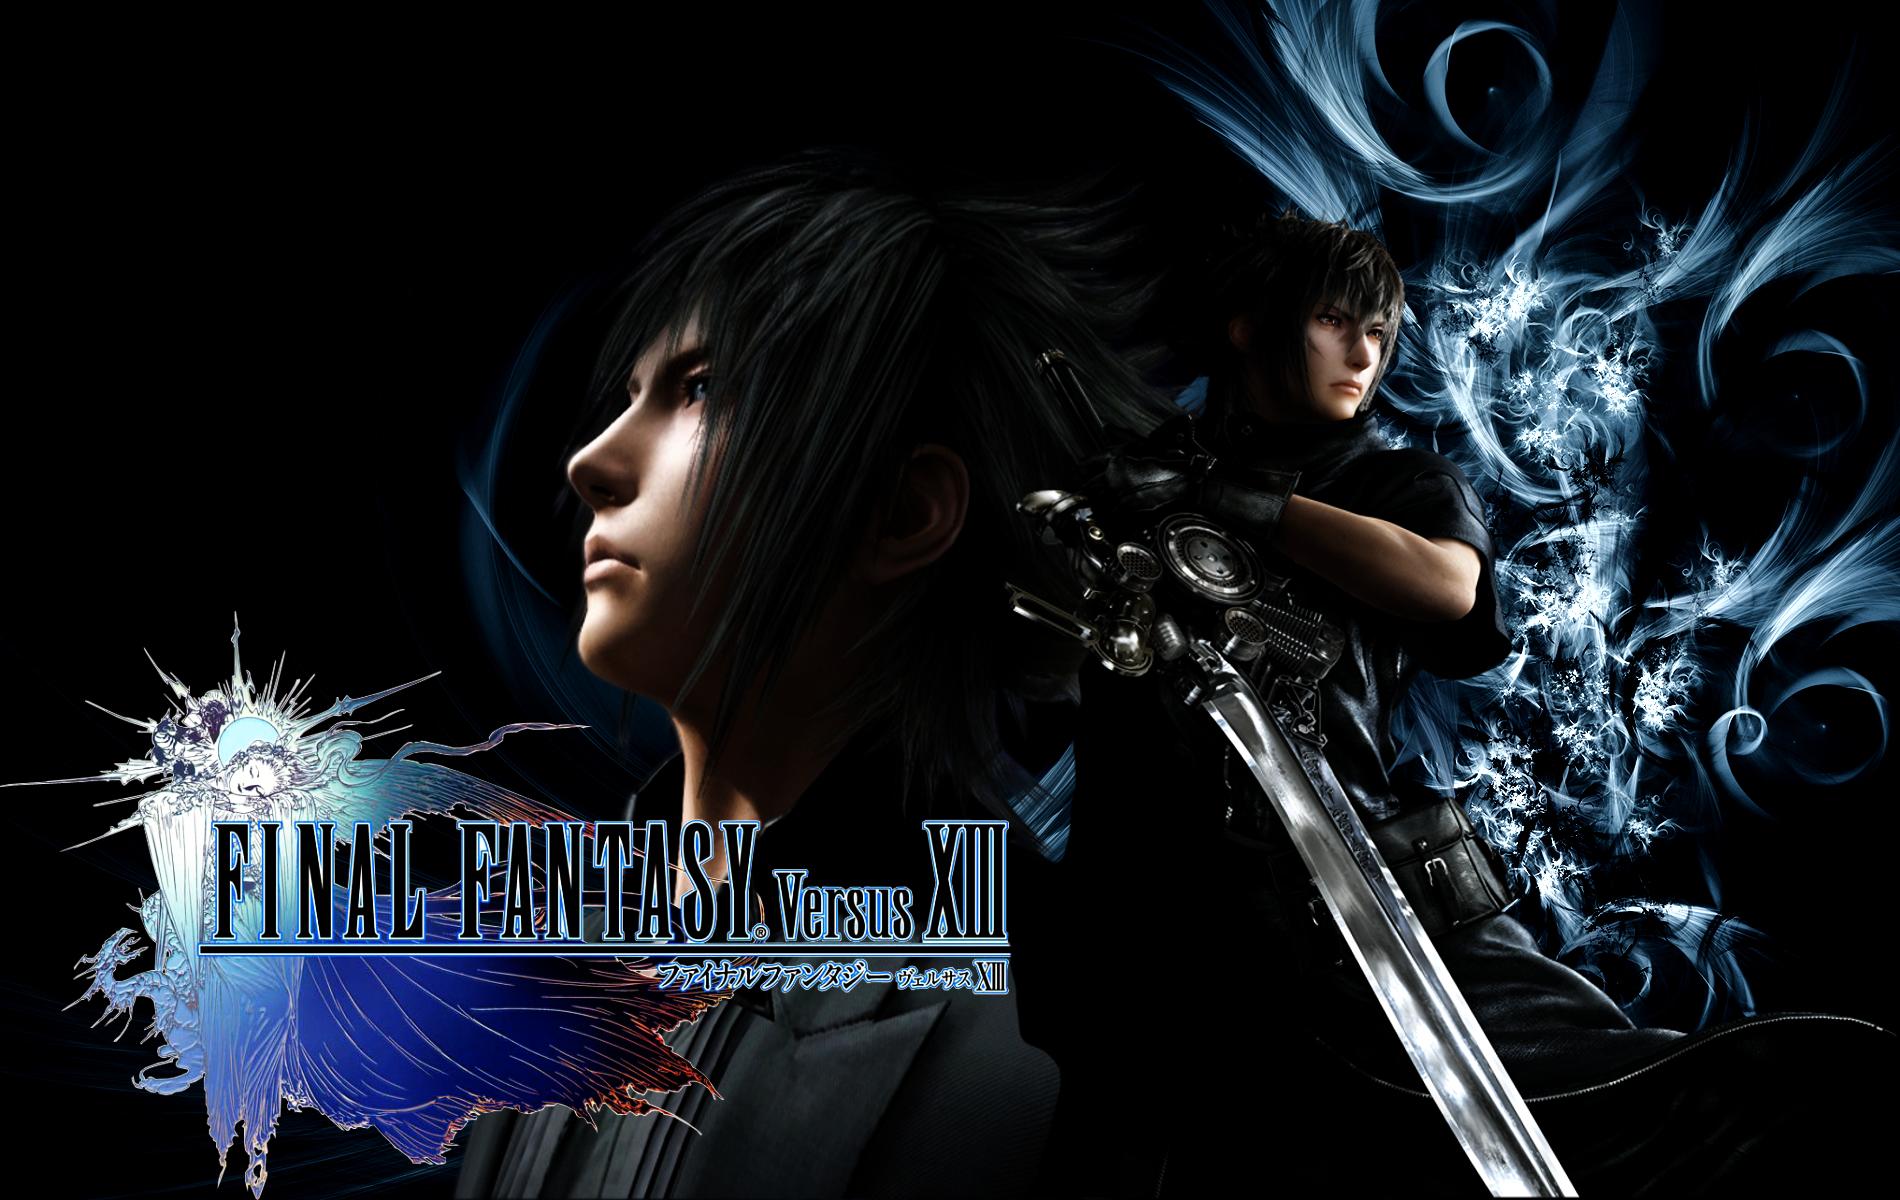 Final Fantasy Xiii Noctis Lucis Caelum By Viciousjosh On Deviantart